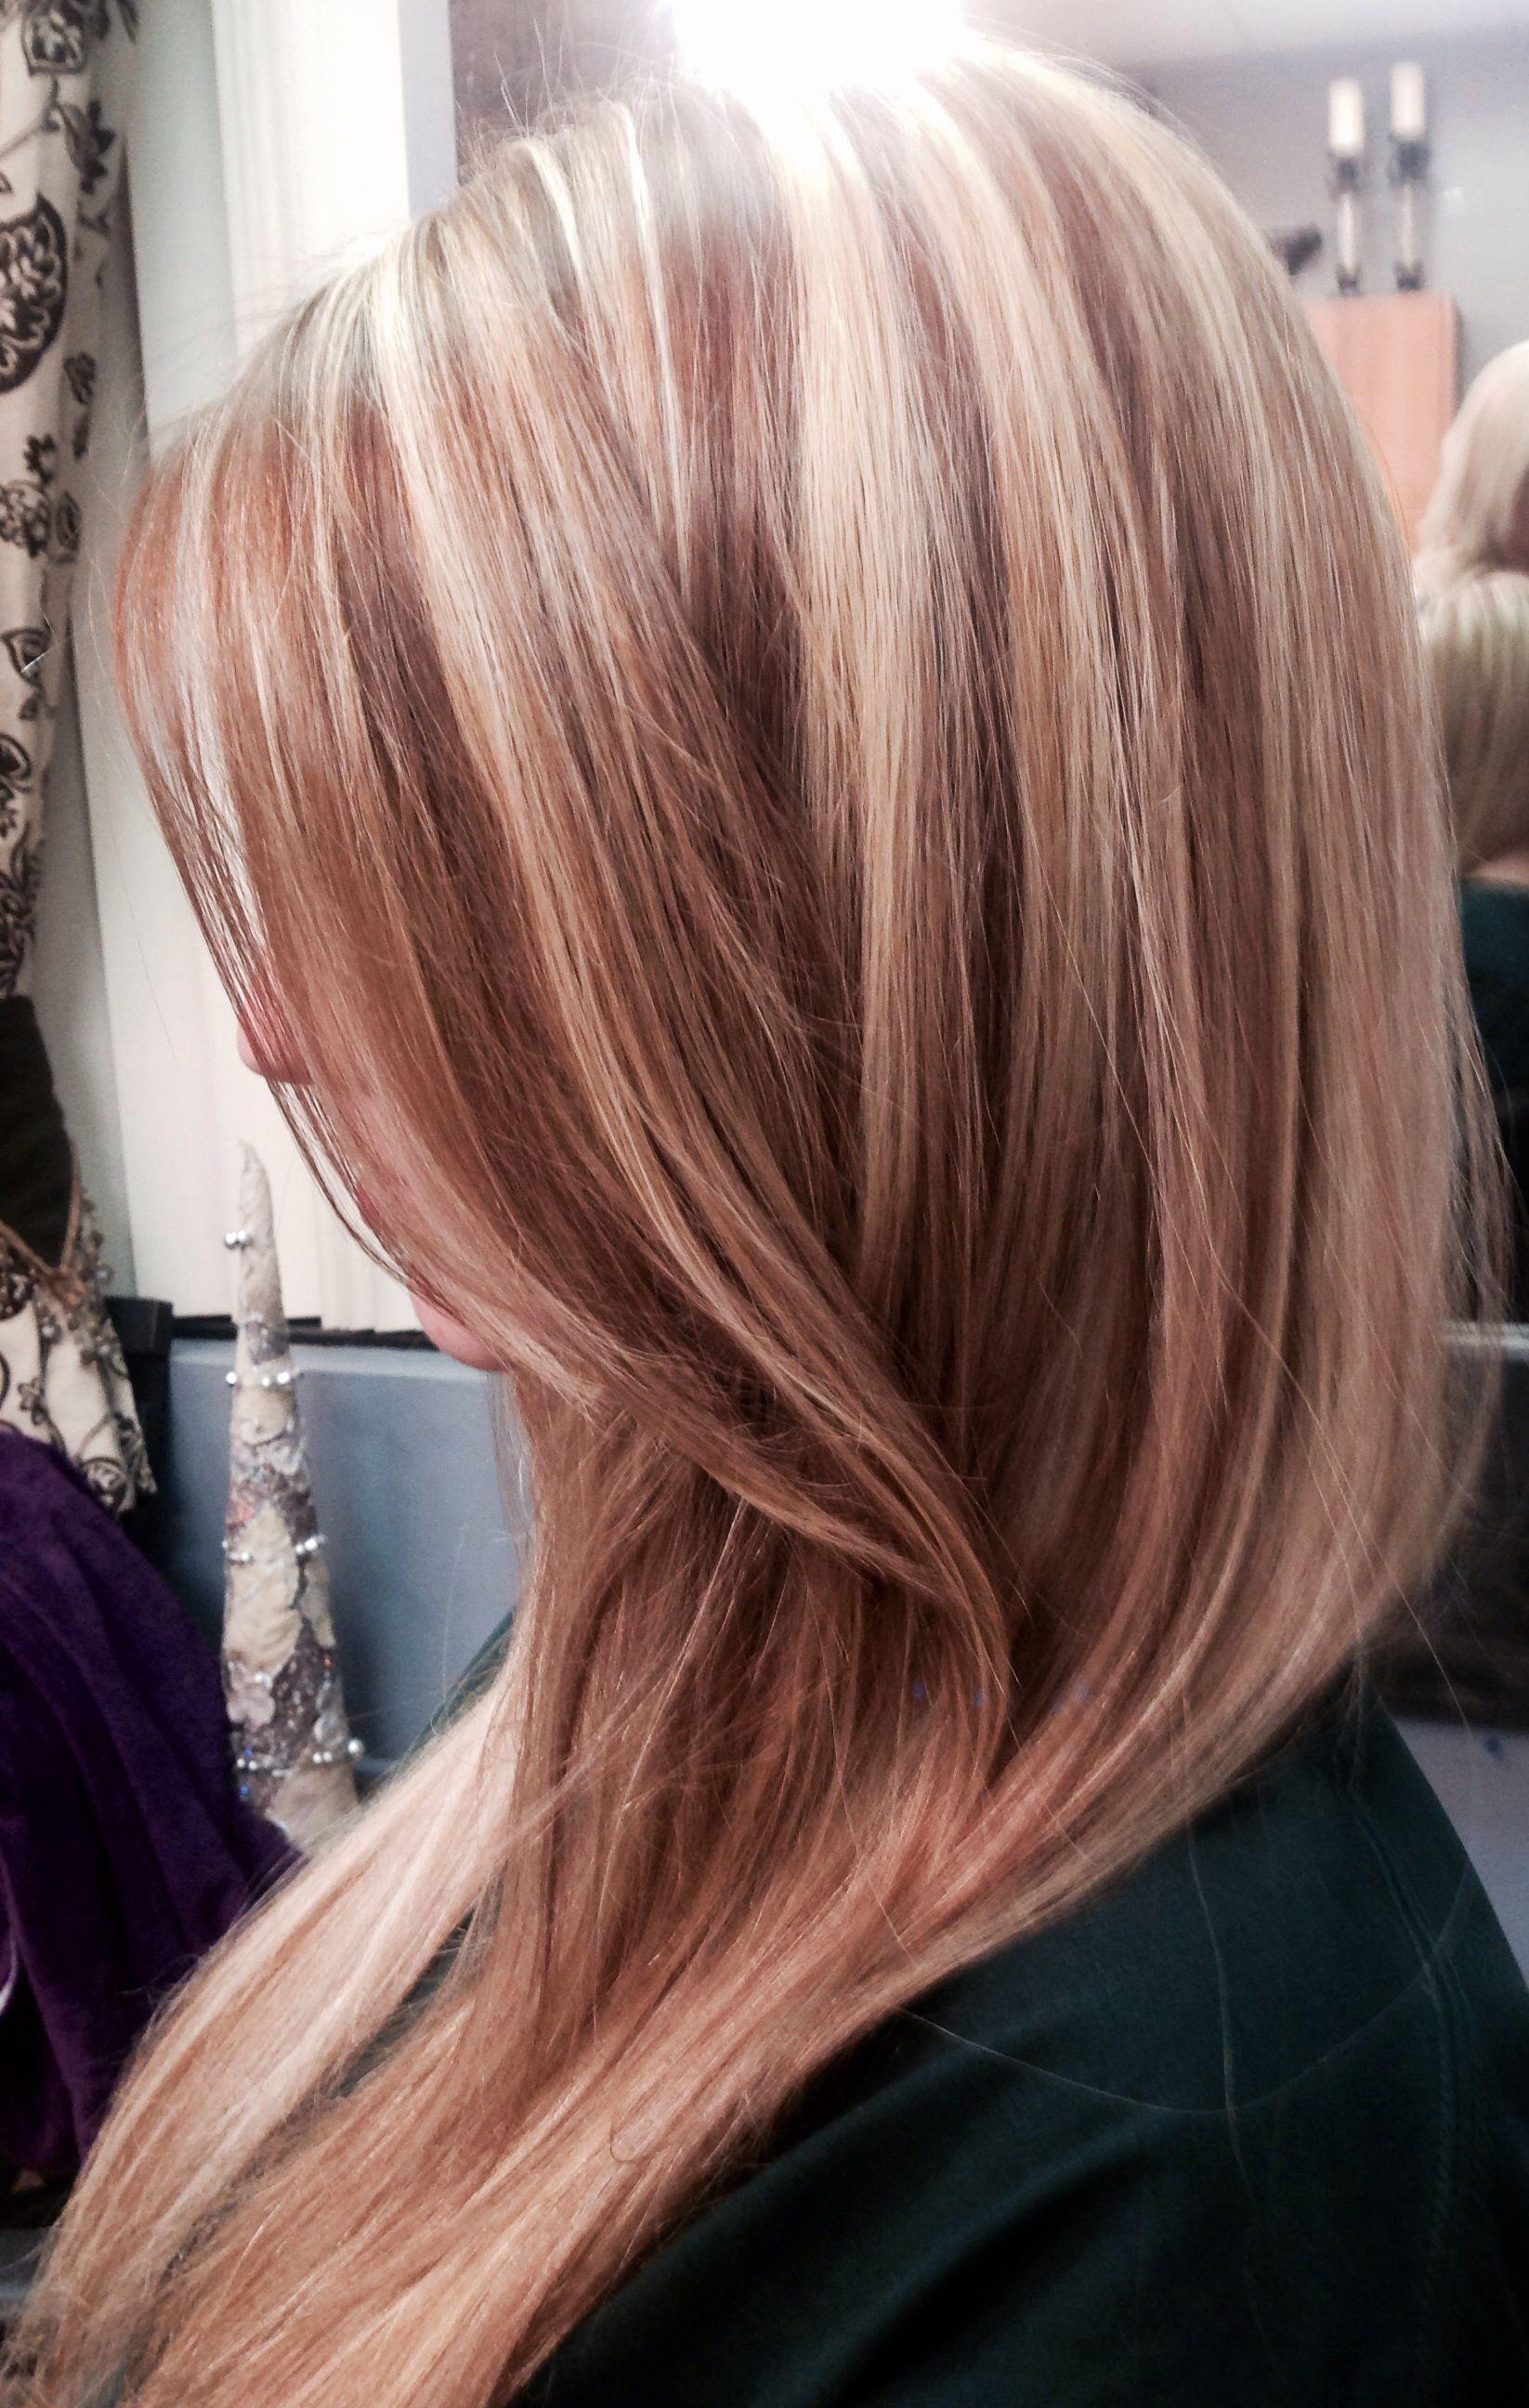 Long Hair Blonde Hair Highlight Lowlights Lights And Dark Pretty